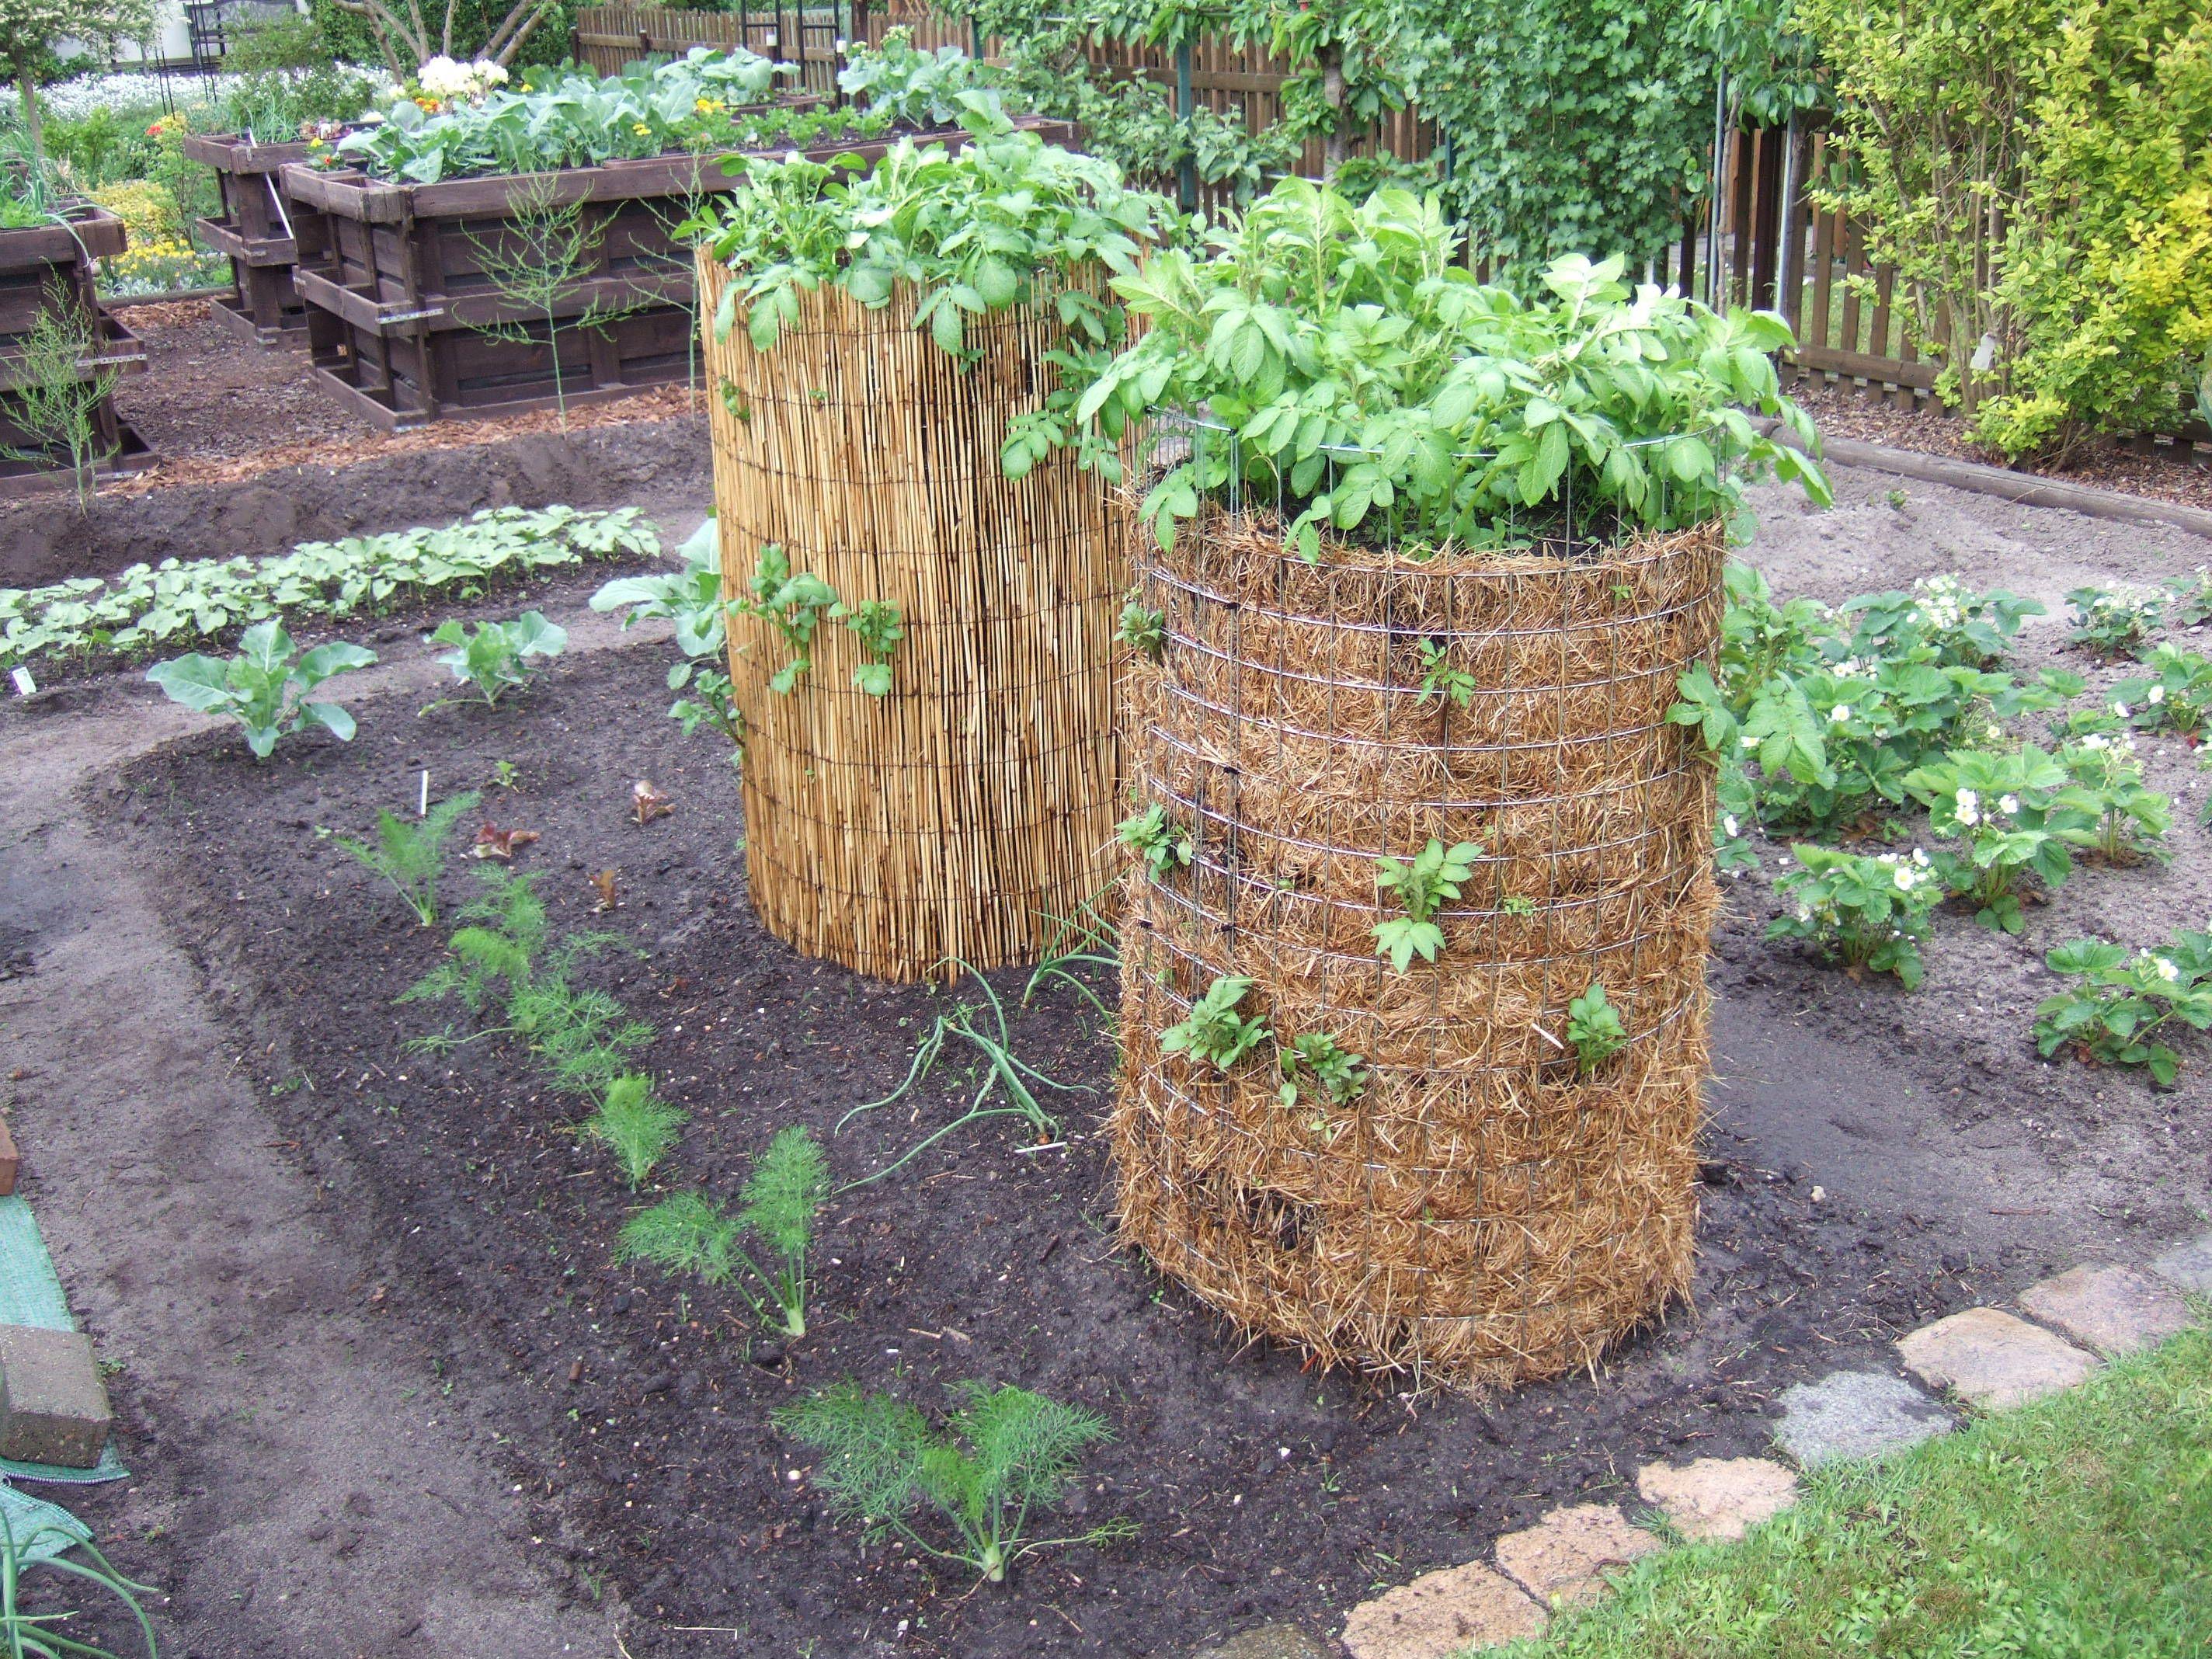 Perfect Bild MB Garten Forum Haus Pflanzen Gartenpflege u Hausbau